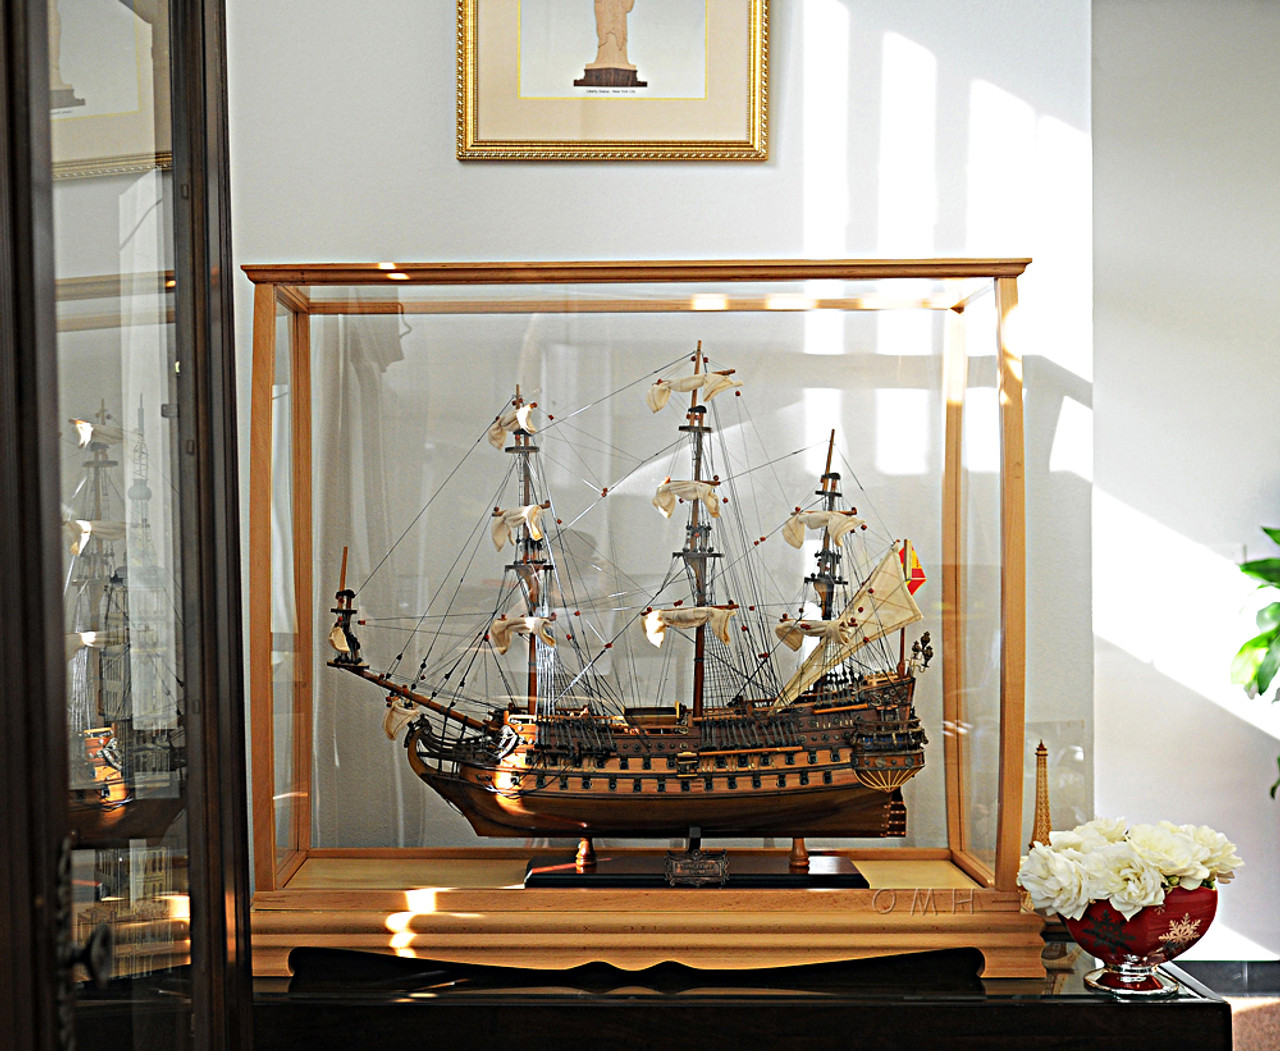 Display Case Tall Ship Yacht Sailboat Model